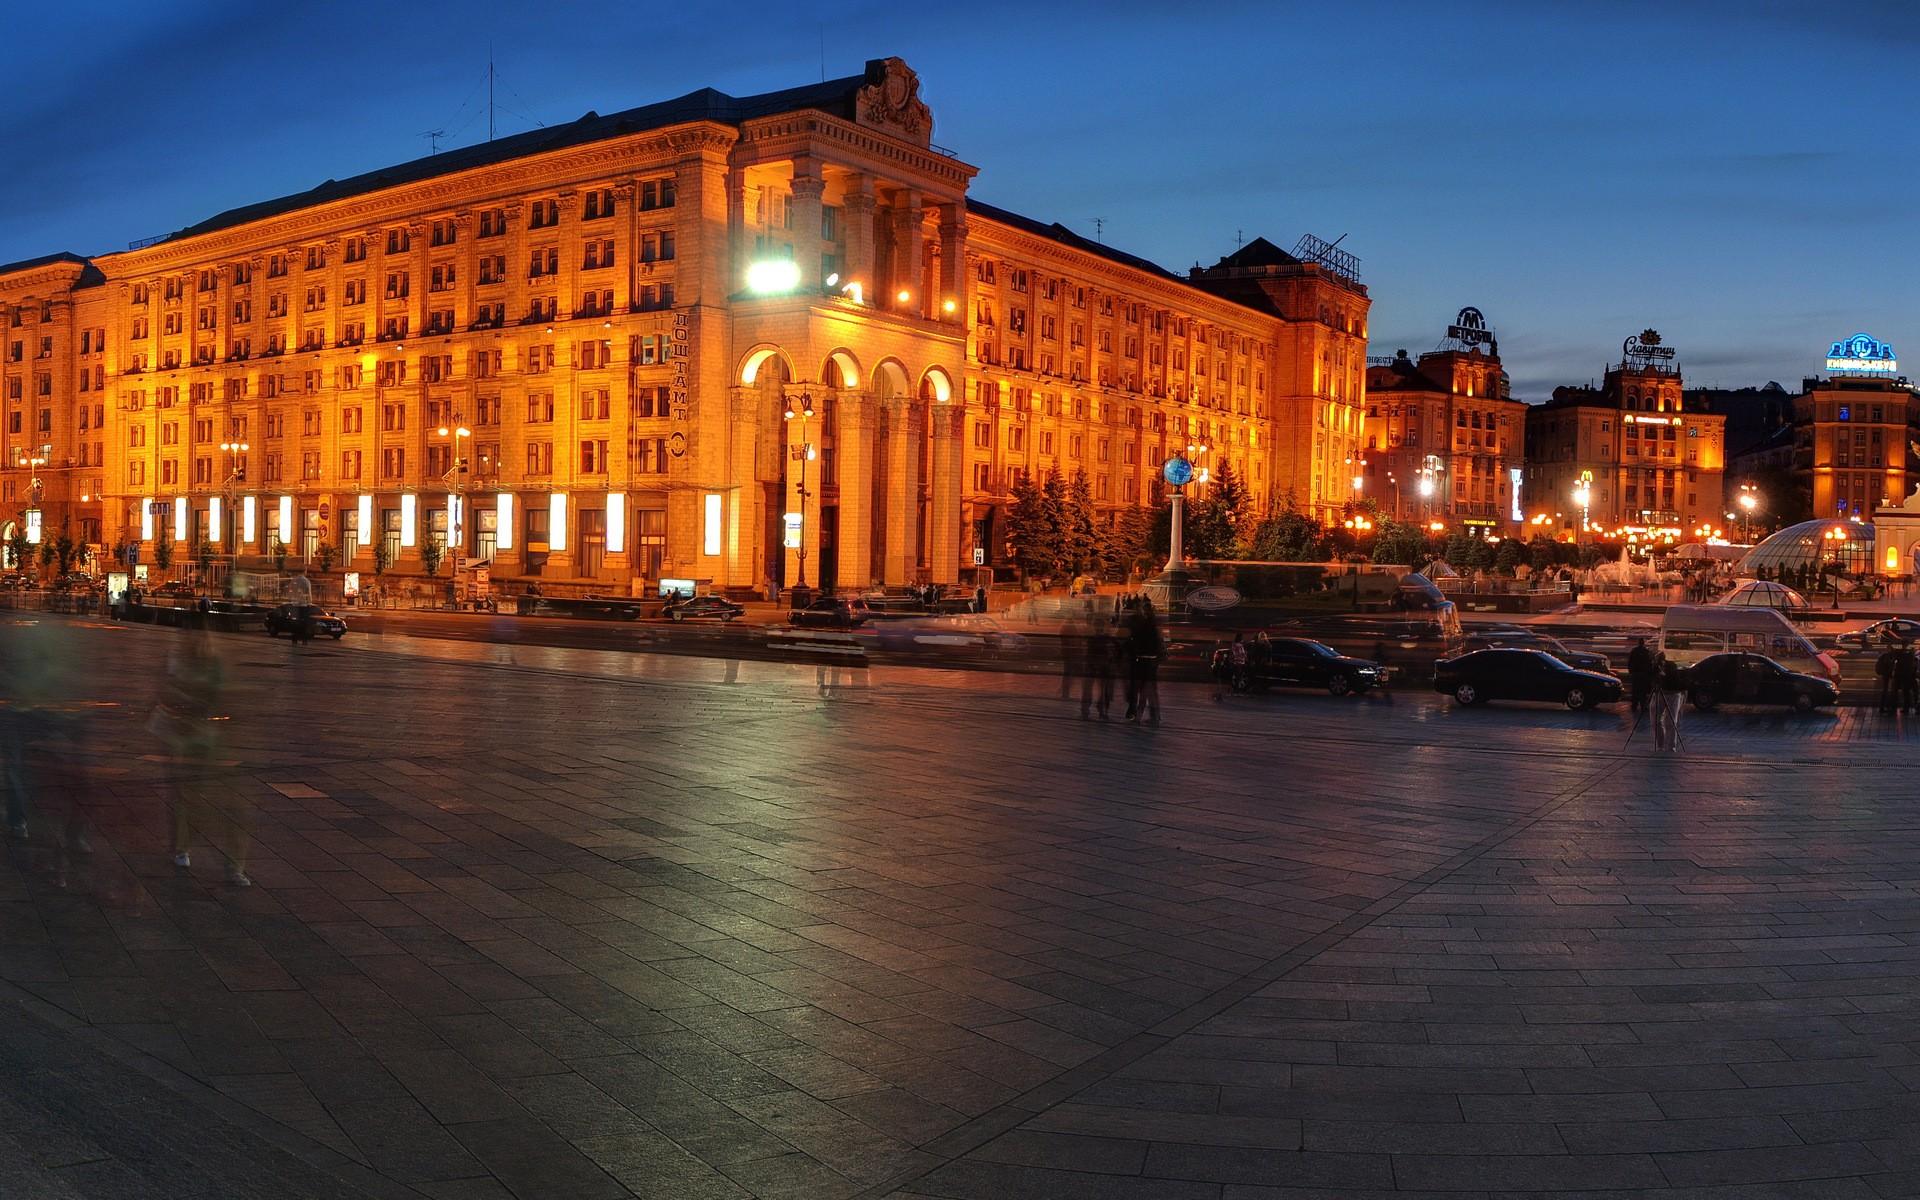 Express Ukrayna Turu 5 Gece 6 Gün